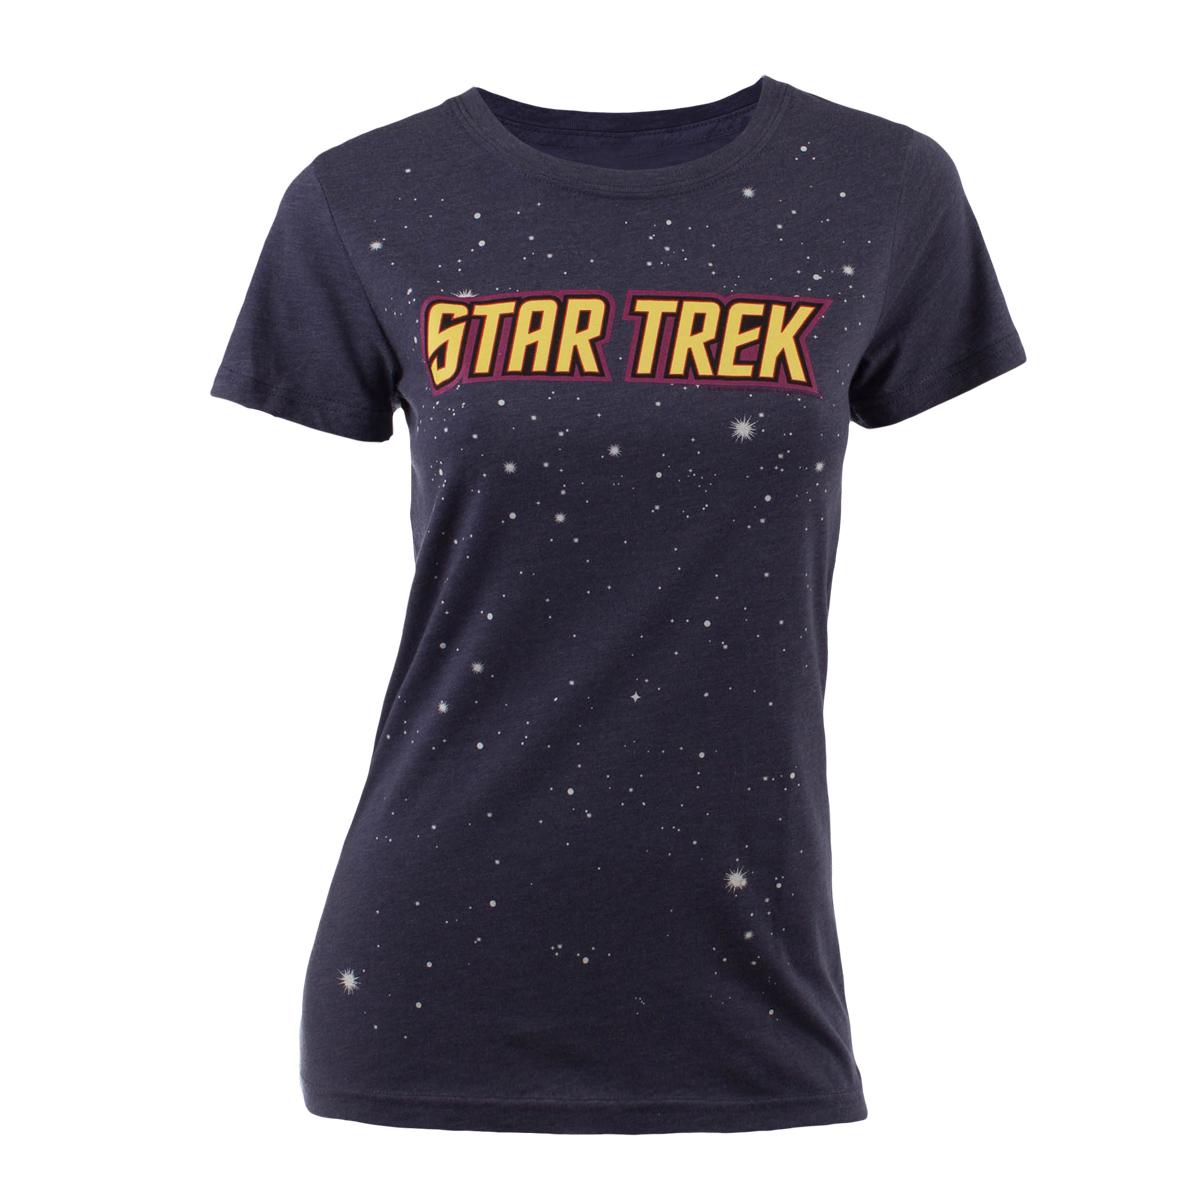 Star Trek Logo with Stars Women's Junior Fit T-Shirt